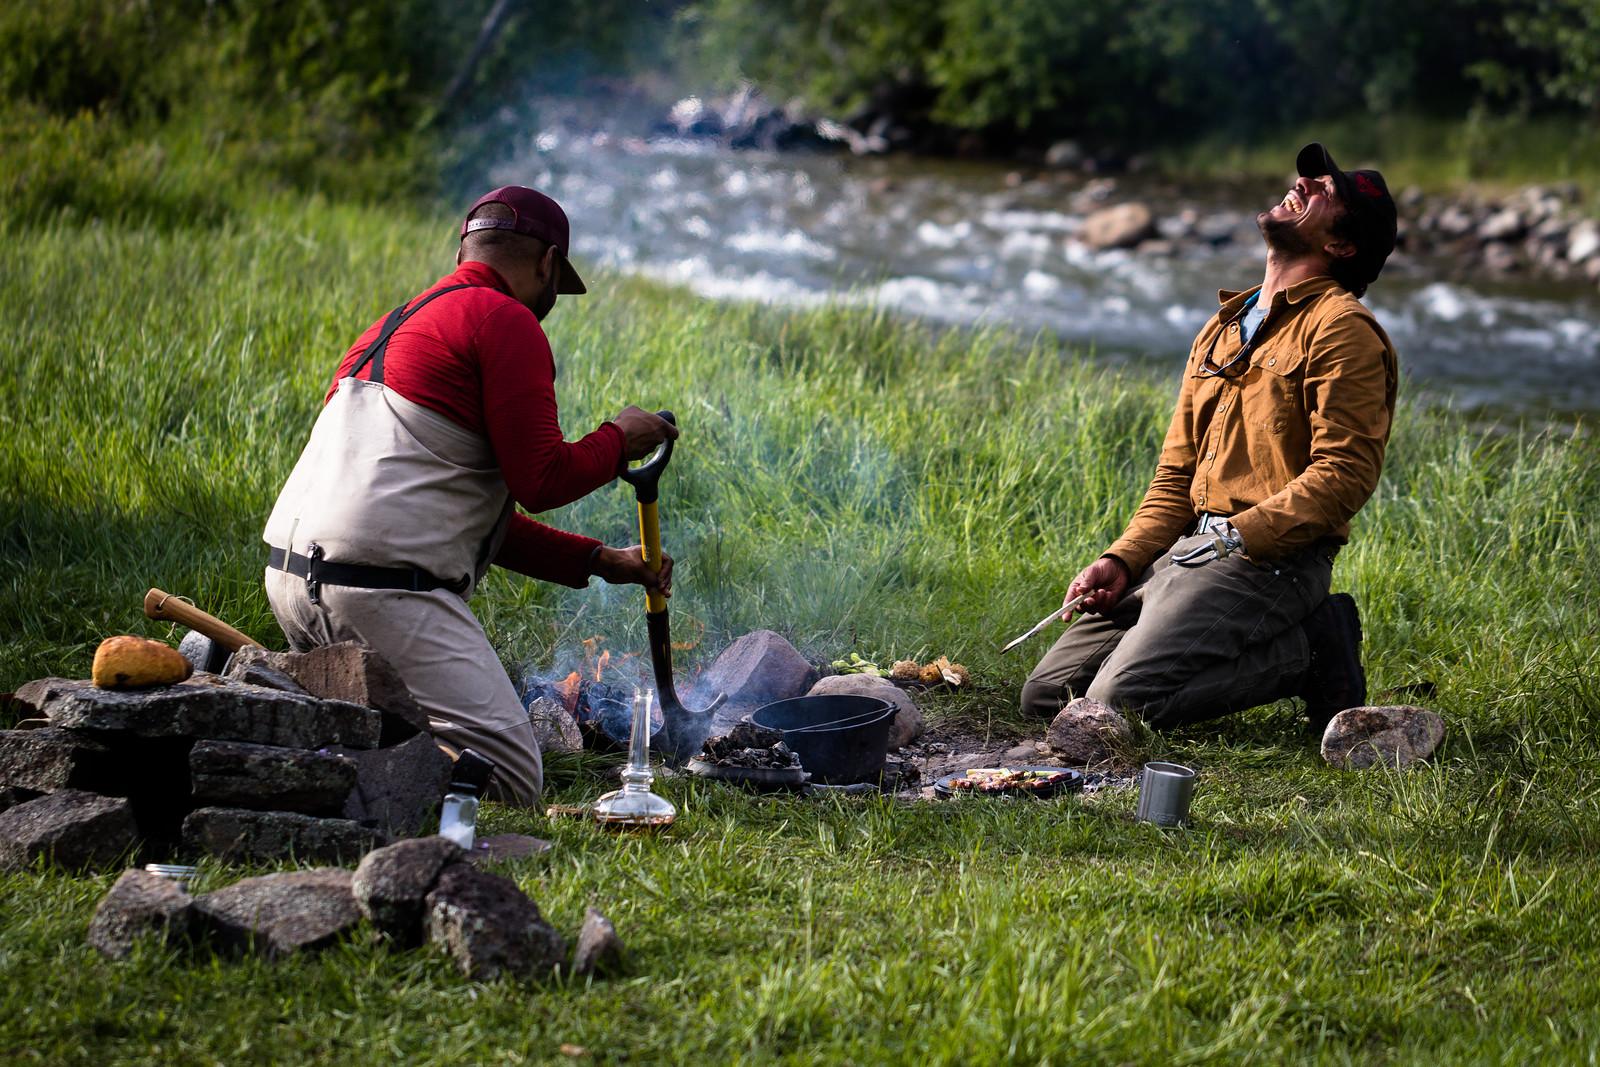 chef eduardo and his chef buddy ranga prepare an epic meal on the yellowstone river. photo: steven drake